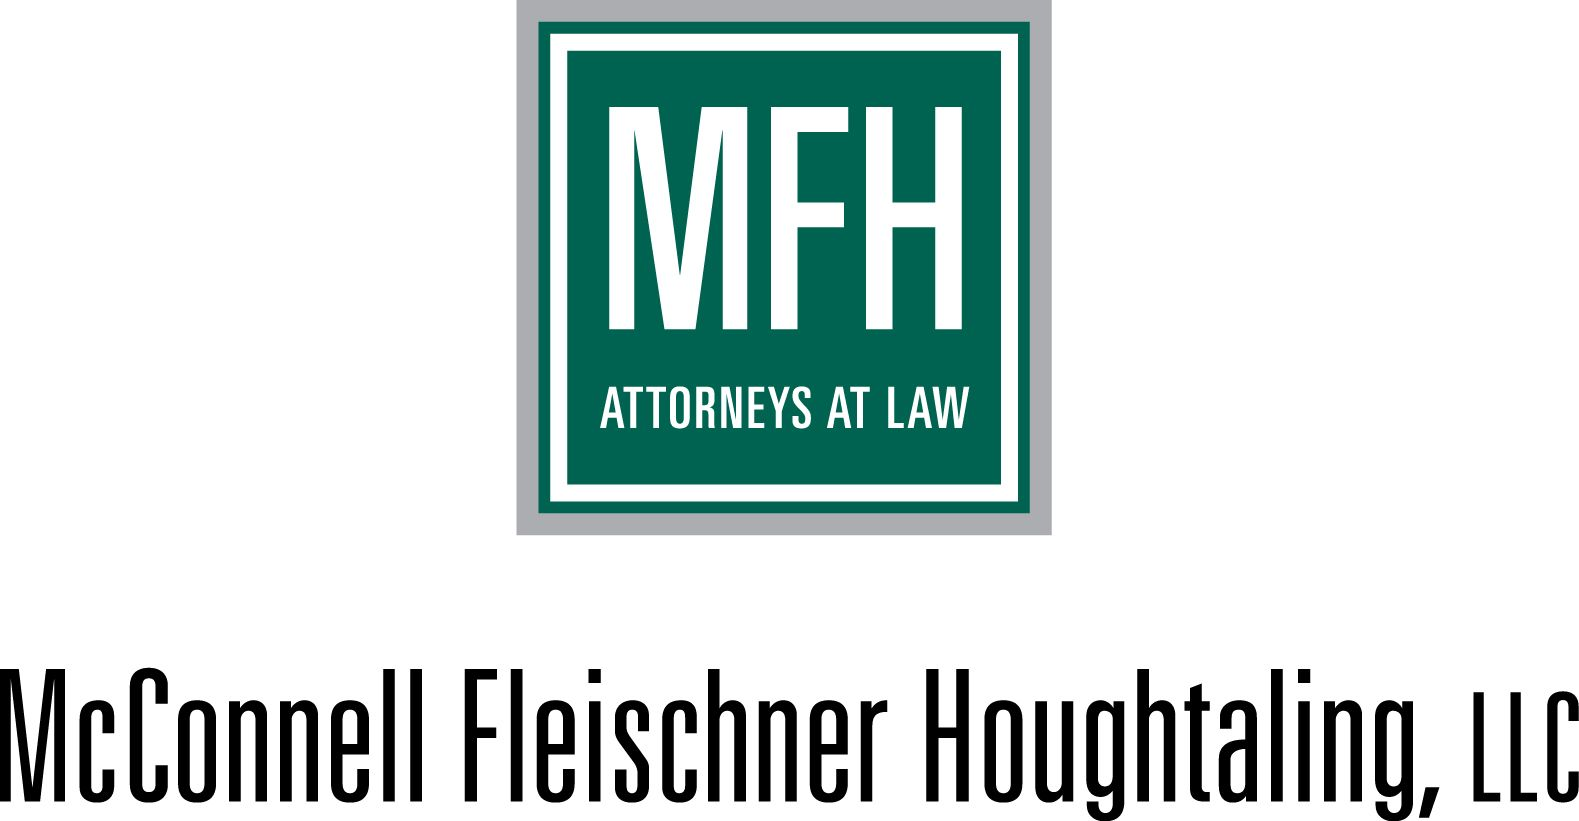 McConnell Fleischner Houghtaling, LLC